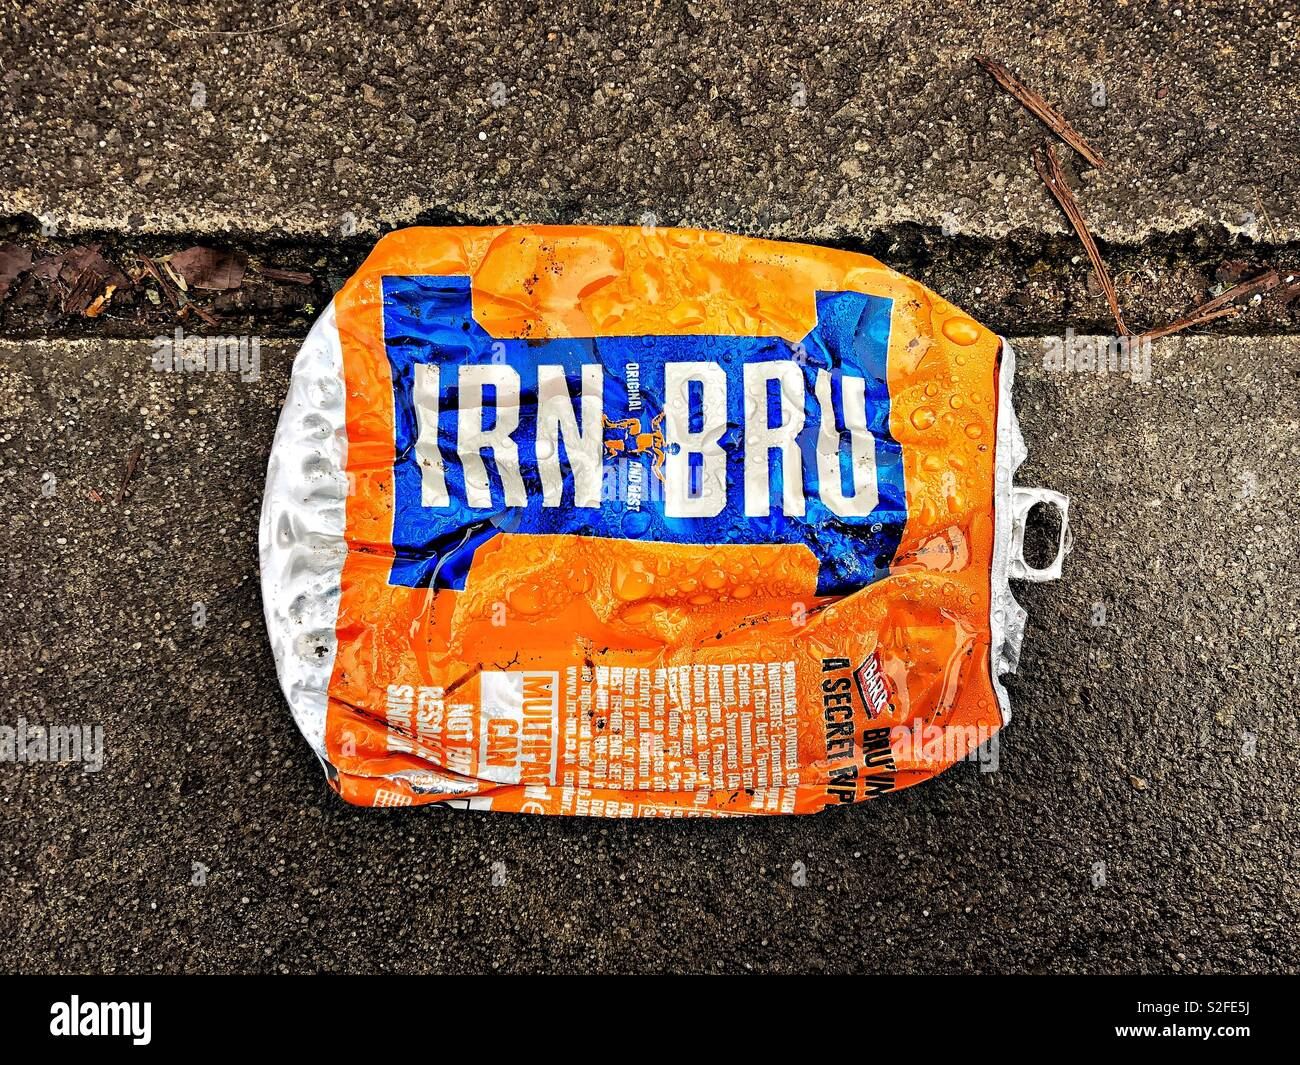 Flattened Irn Bru can. - Stock Image